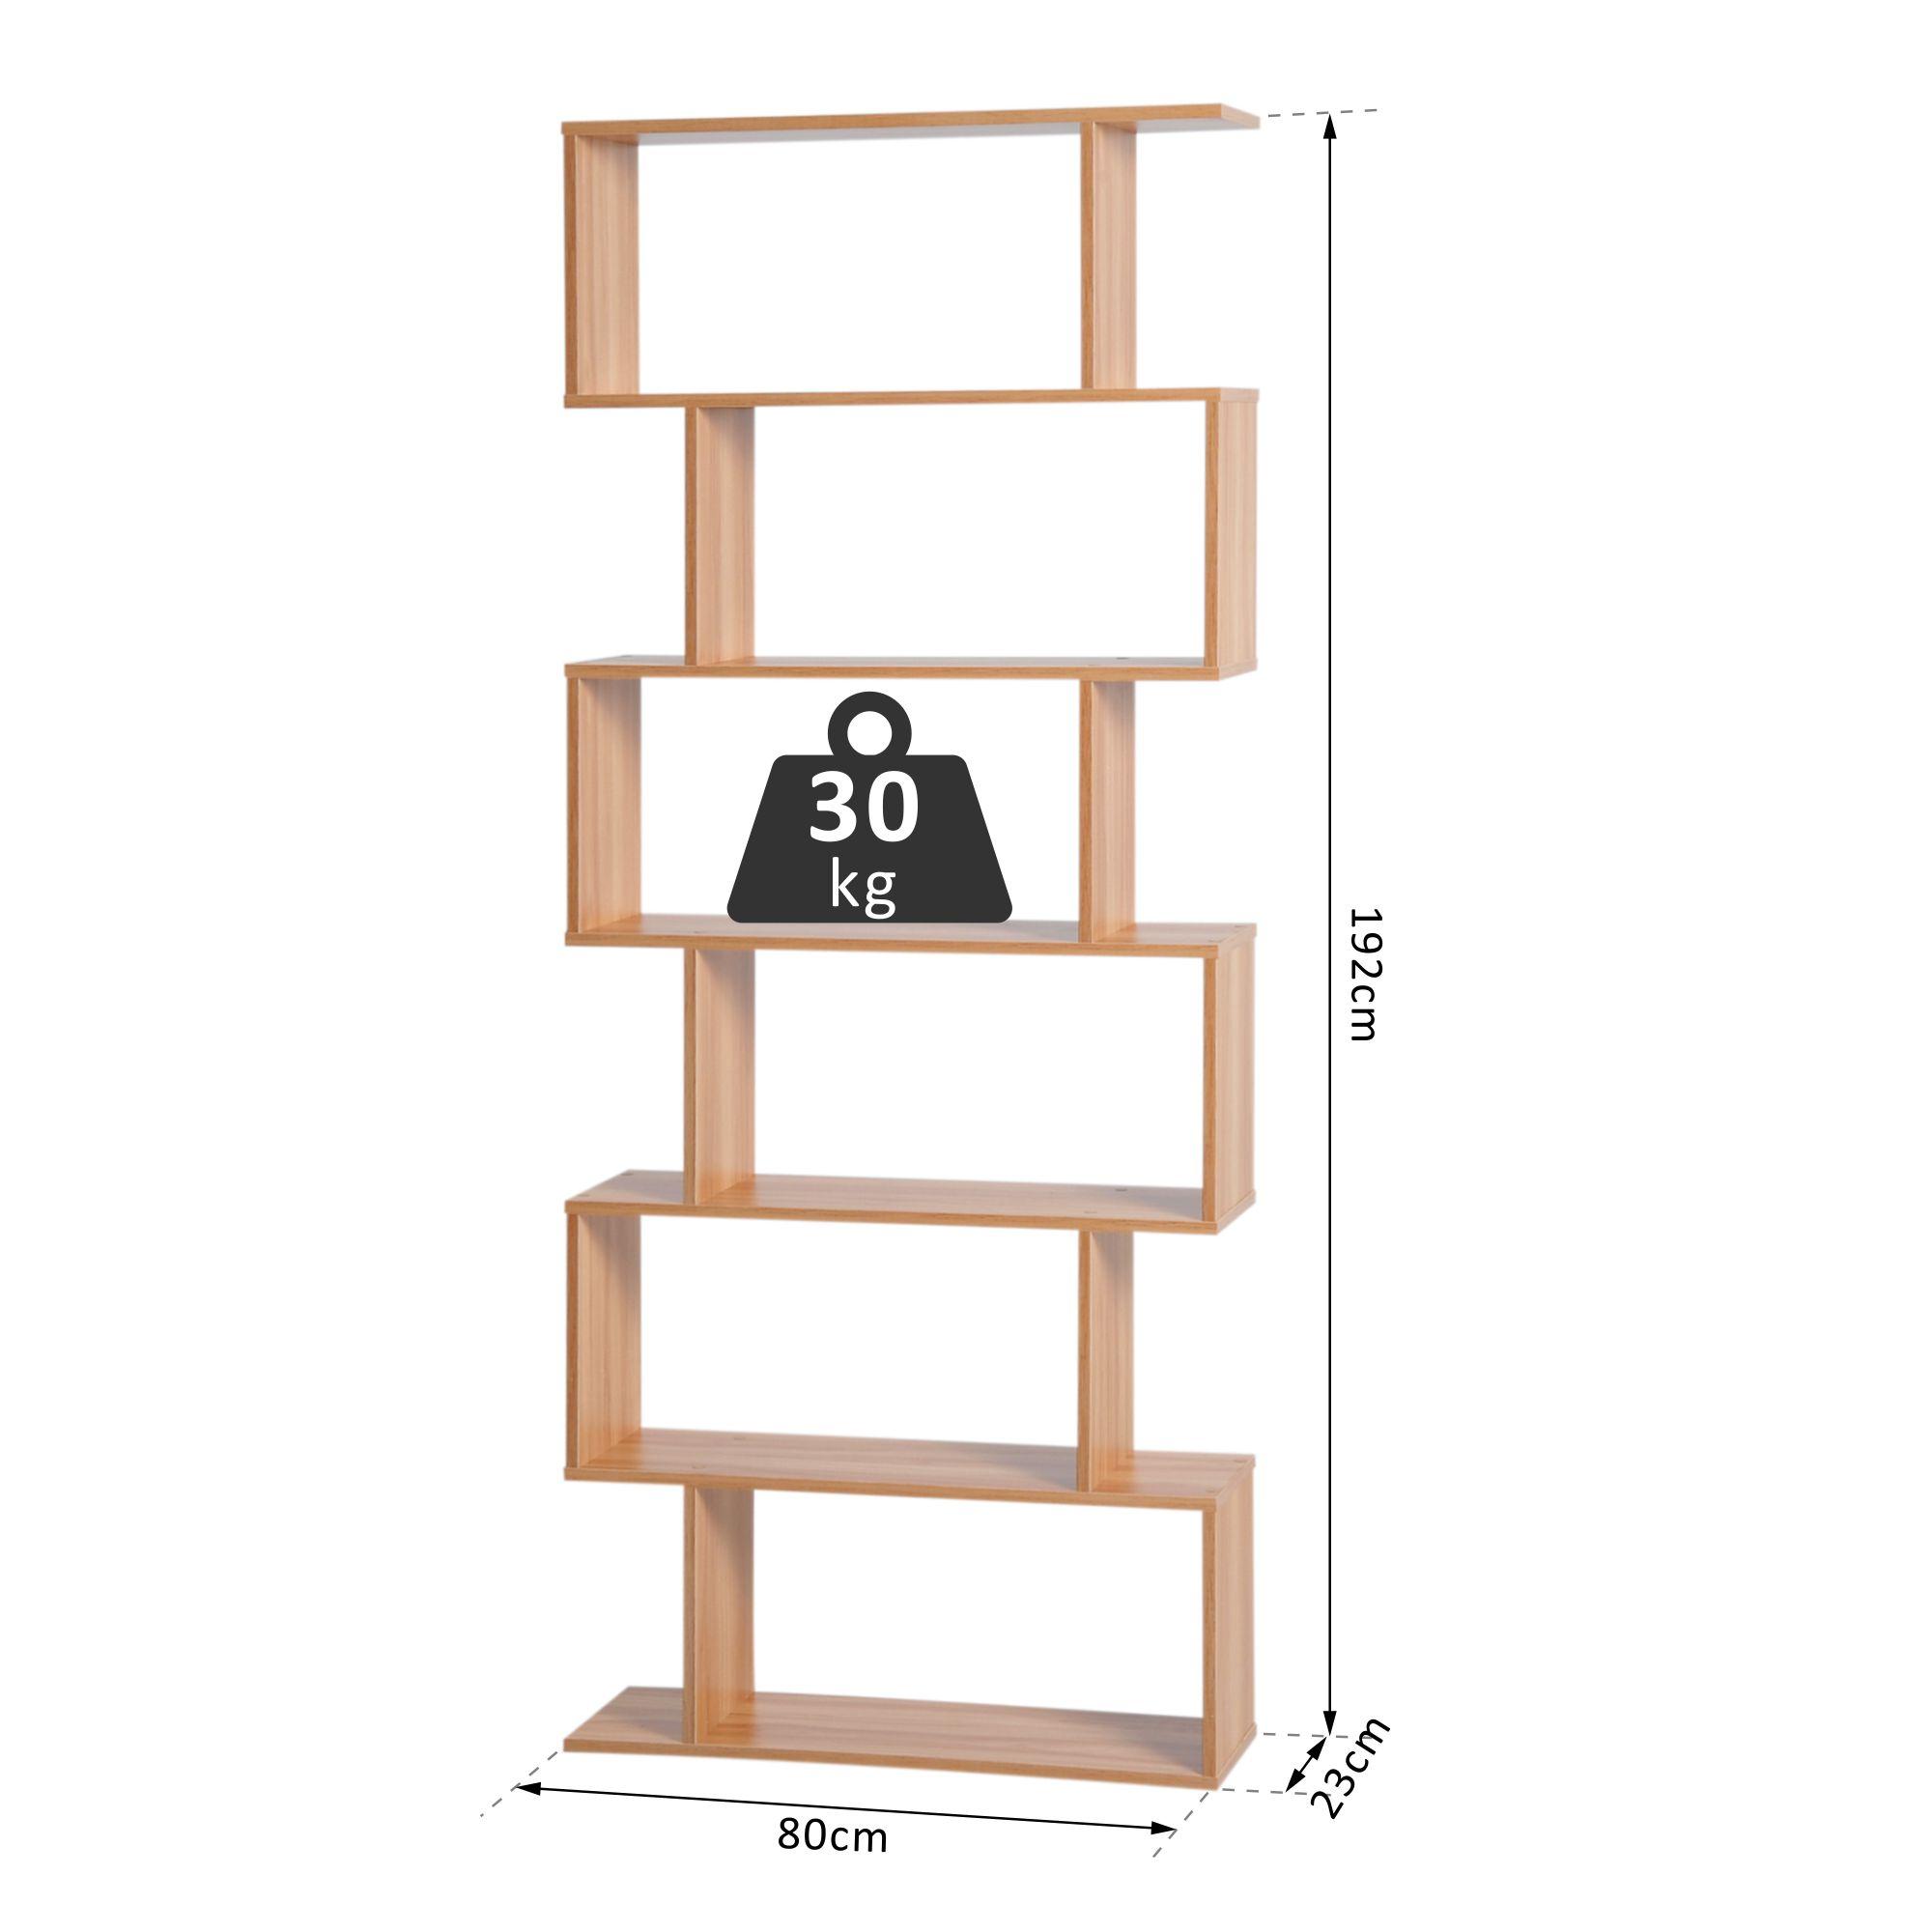 6 Tier Wooden Modern S Shaped Shelf Unit Storage Display